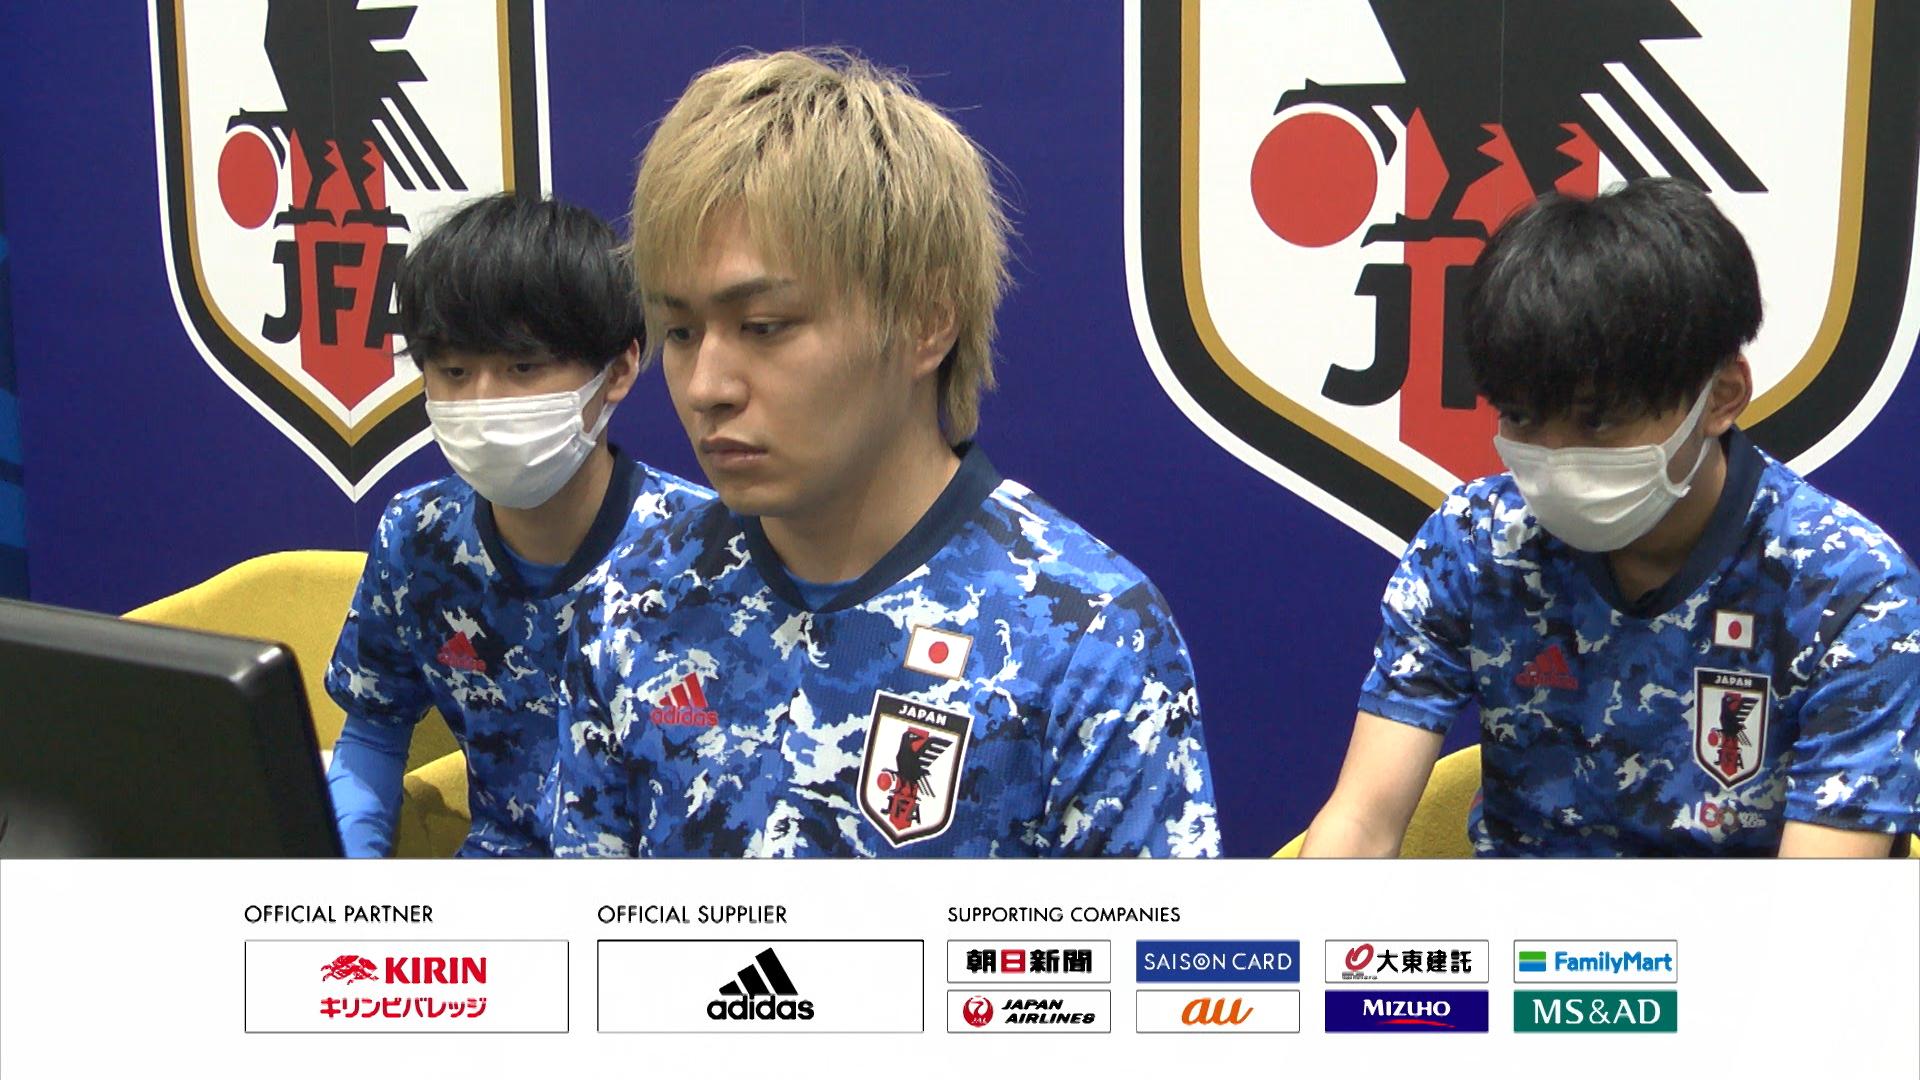 e日本代表、韓国を破りFIFAe Nations Cup本戦出場権を獲得